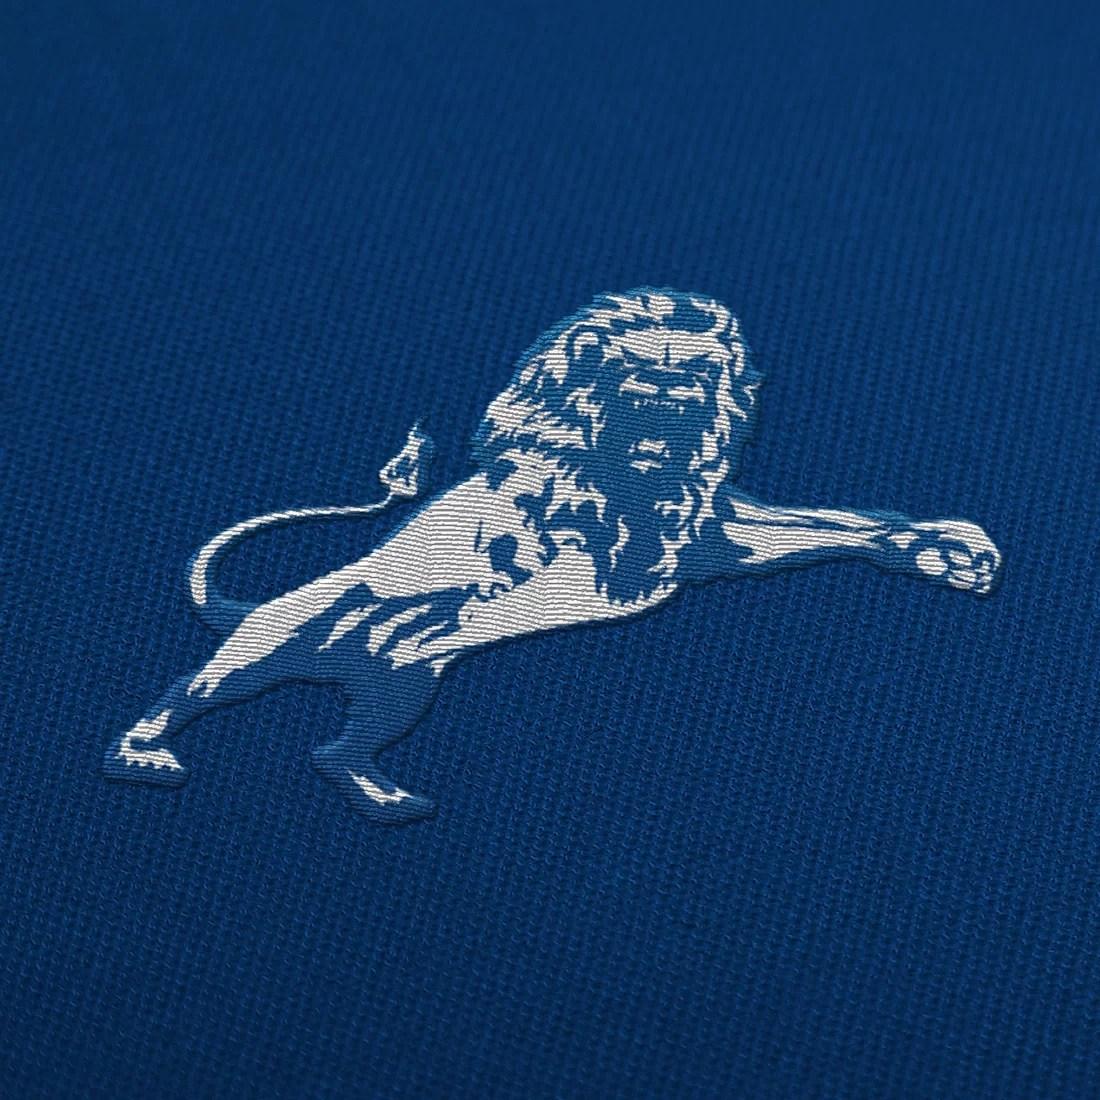 Millwall crest mockup